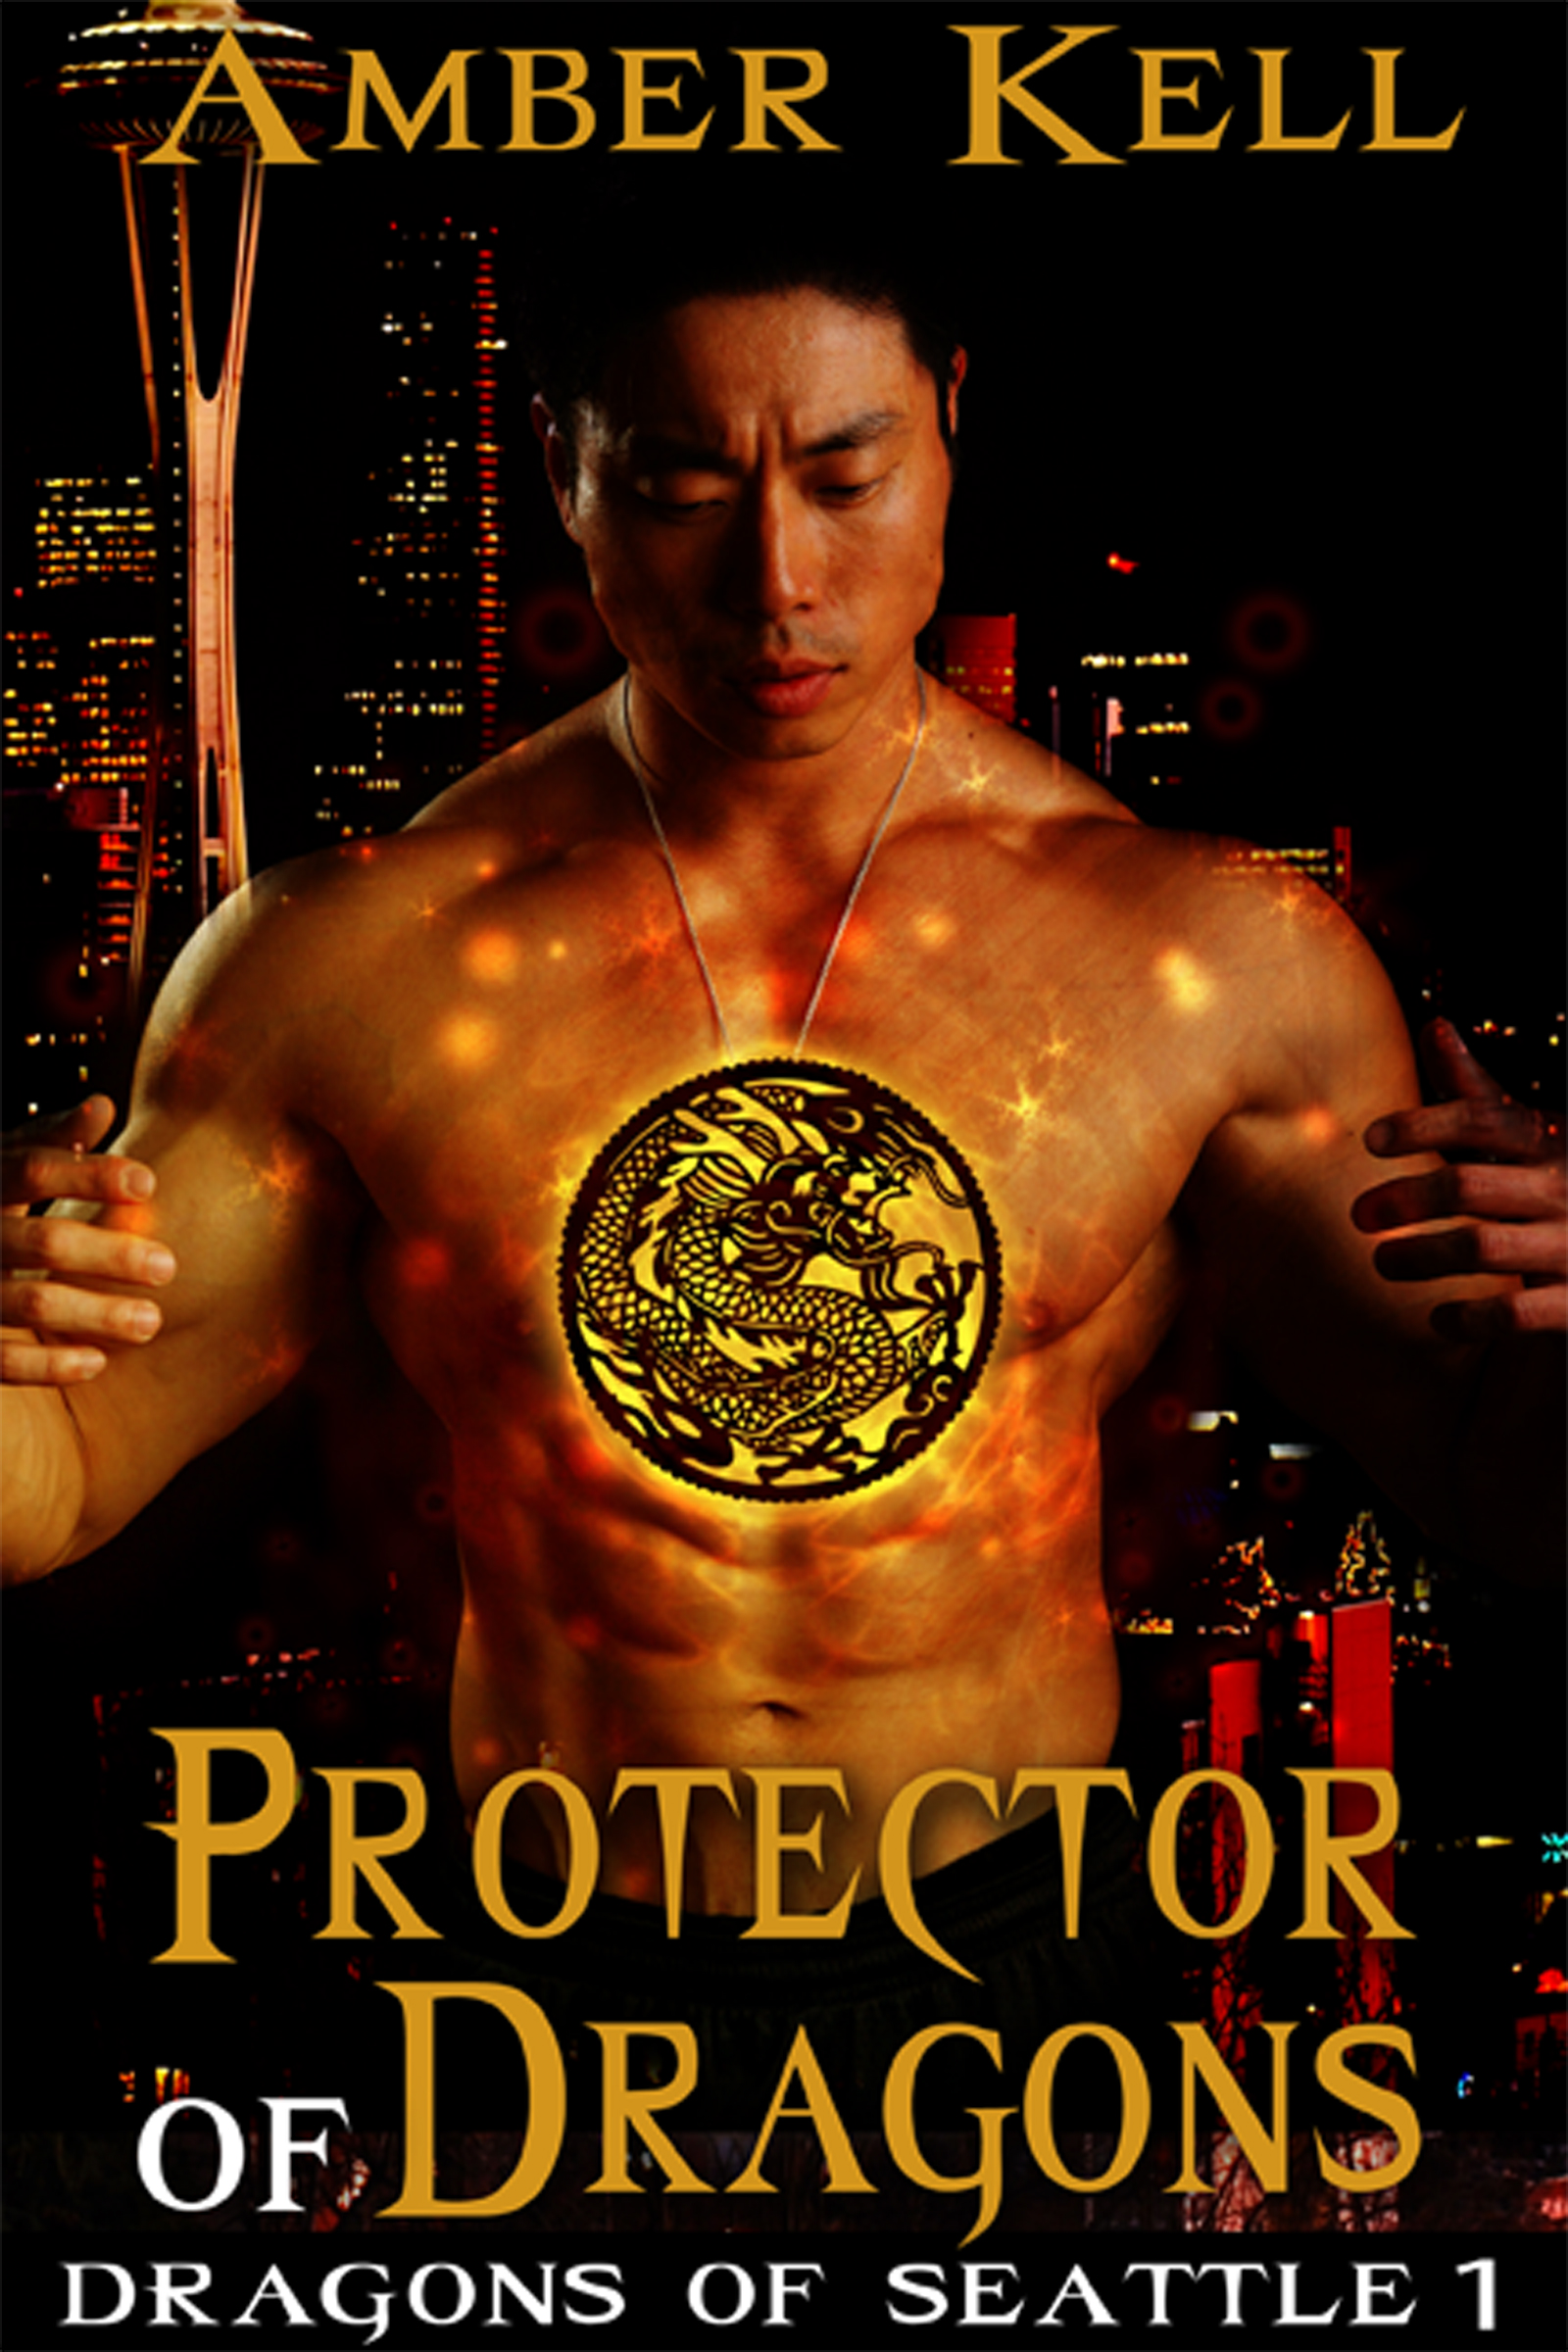 Amber Kell - Protector of Dragons